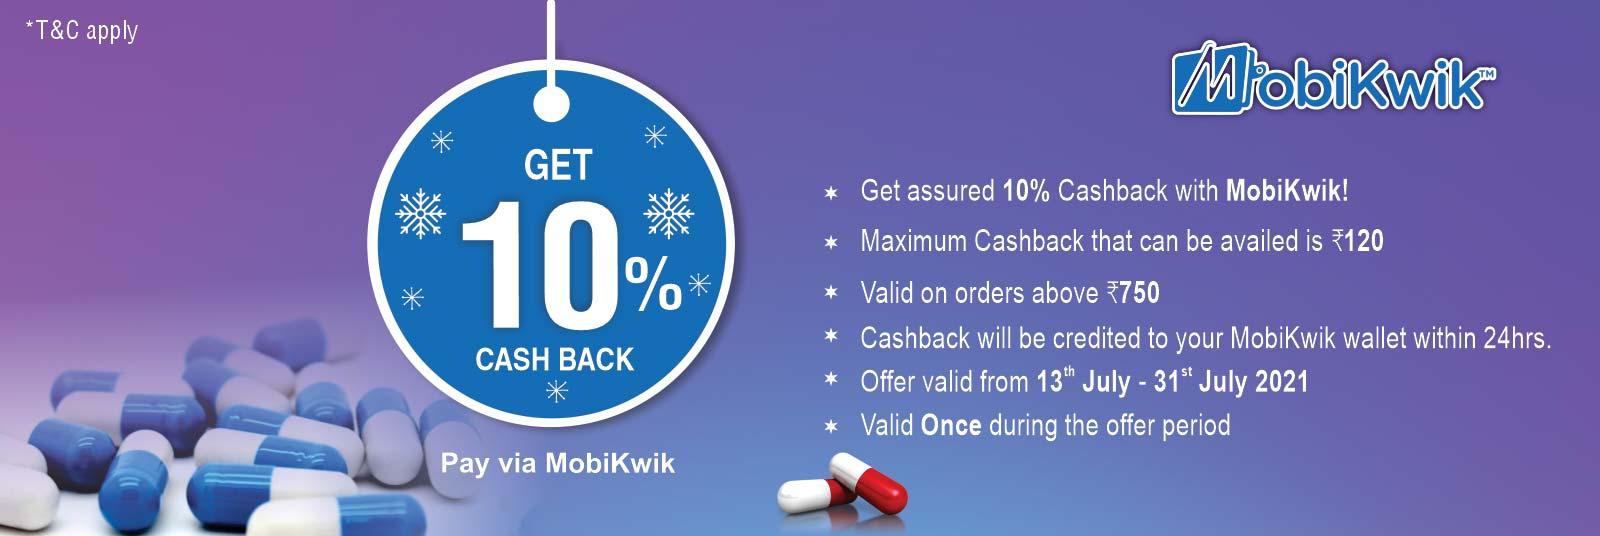 Mobikwik Cash Back